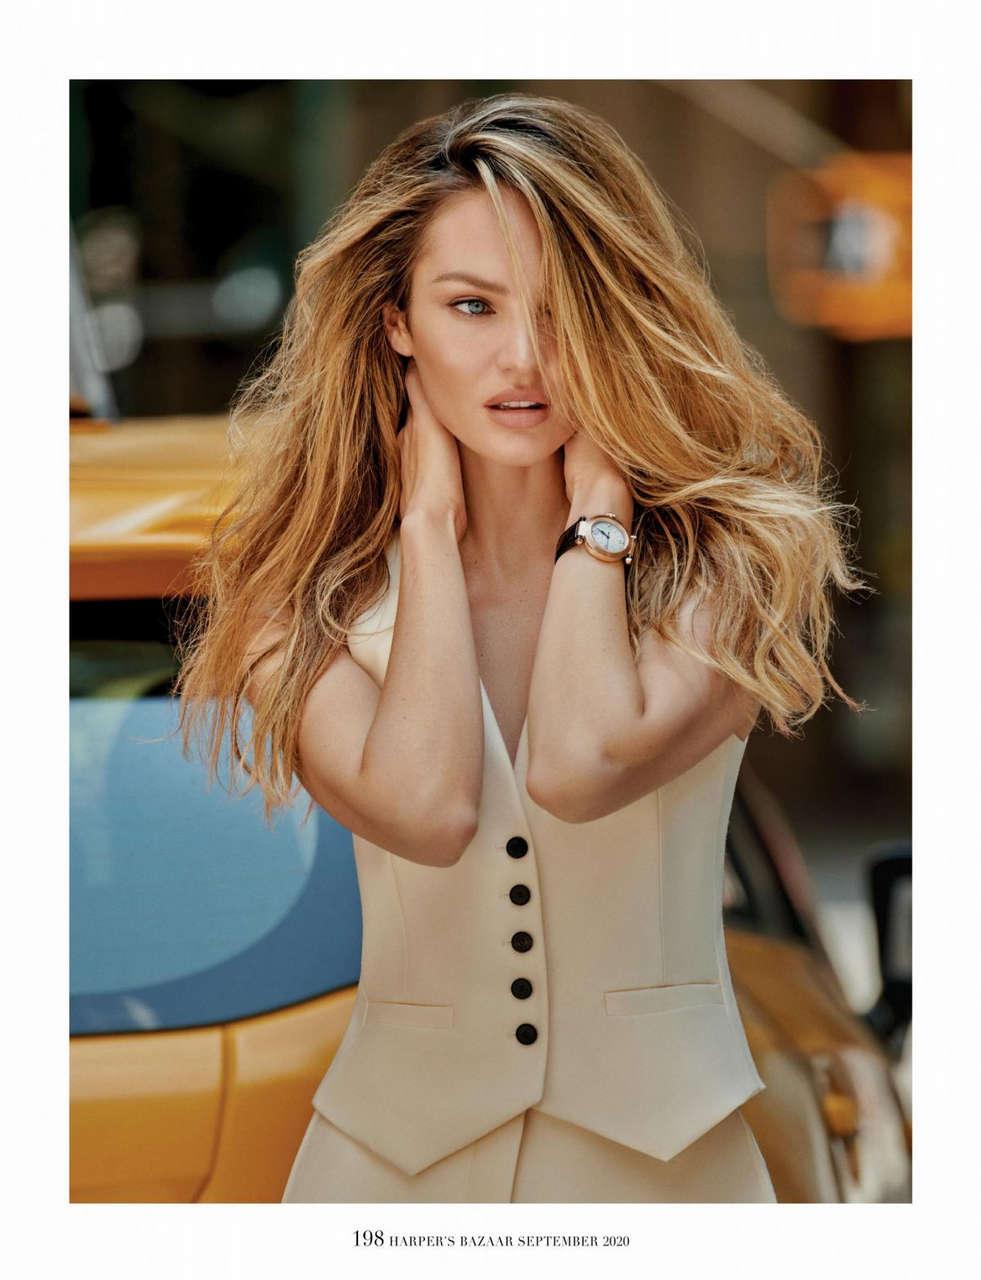 Candice Swanepoel Harpers Bazaar Magazine Singapore September